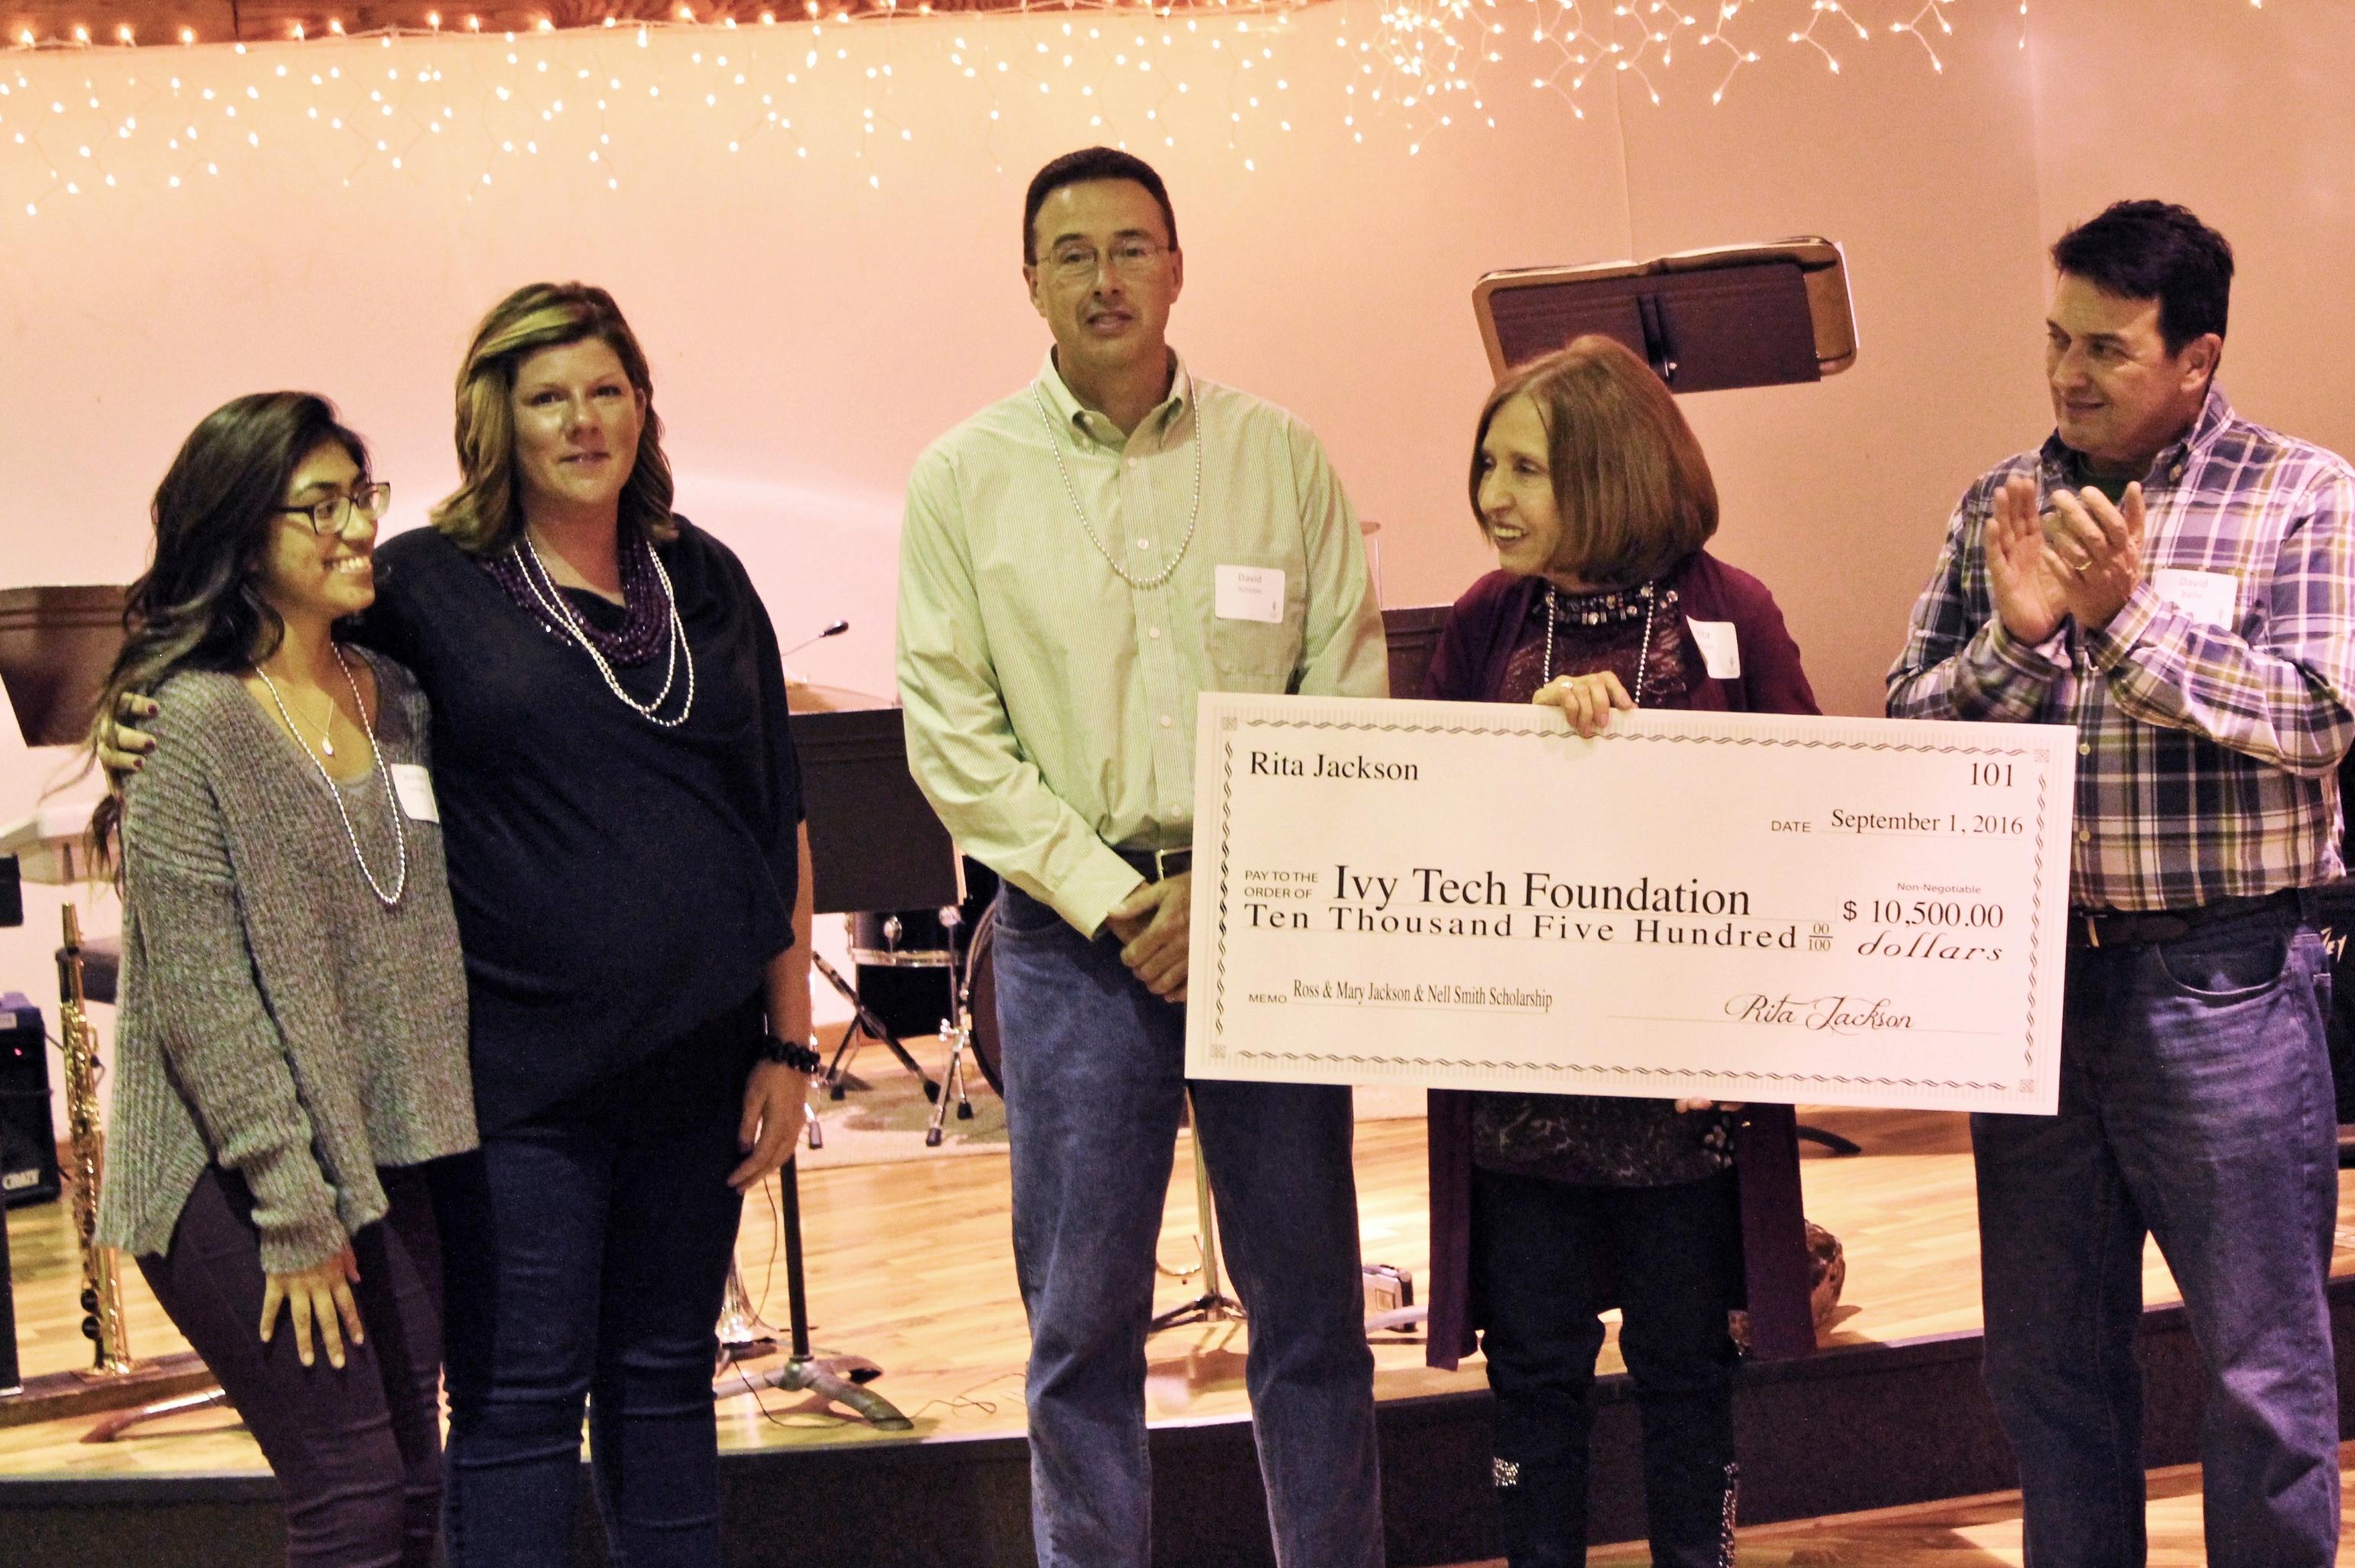 IVY TECH KOKOMO REGION NEWS | Changing lives. Making Indiana great ...